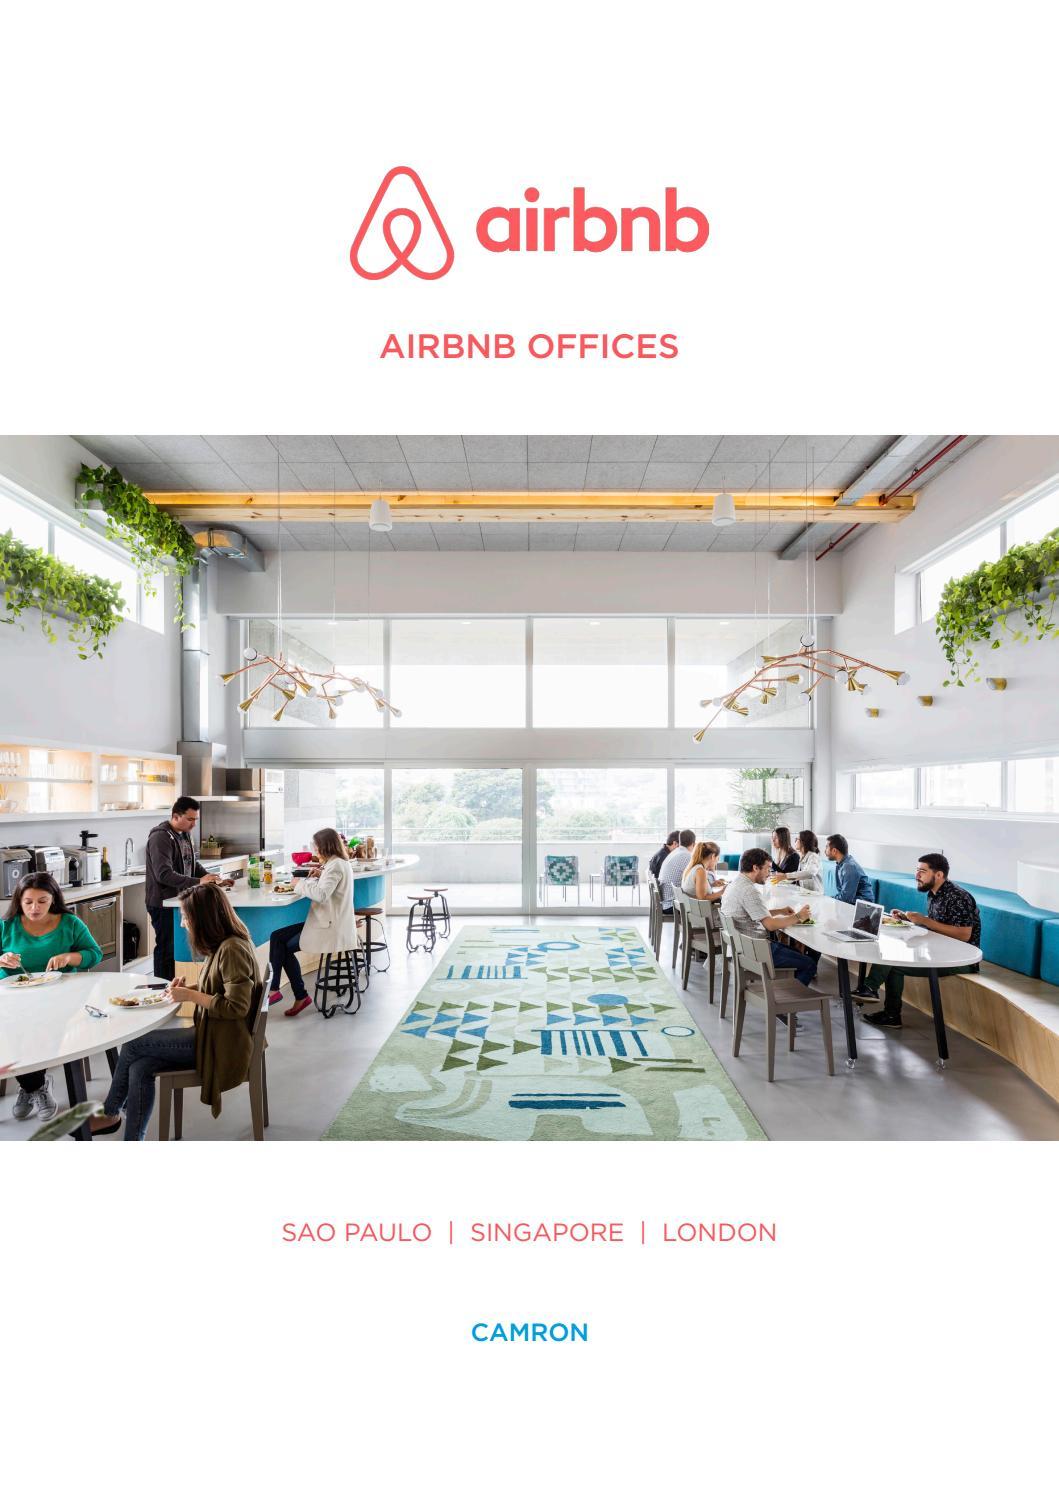 airbnb office london. Airbnb Office London E